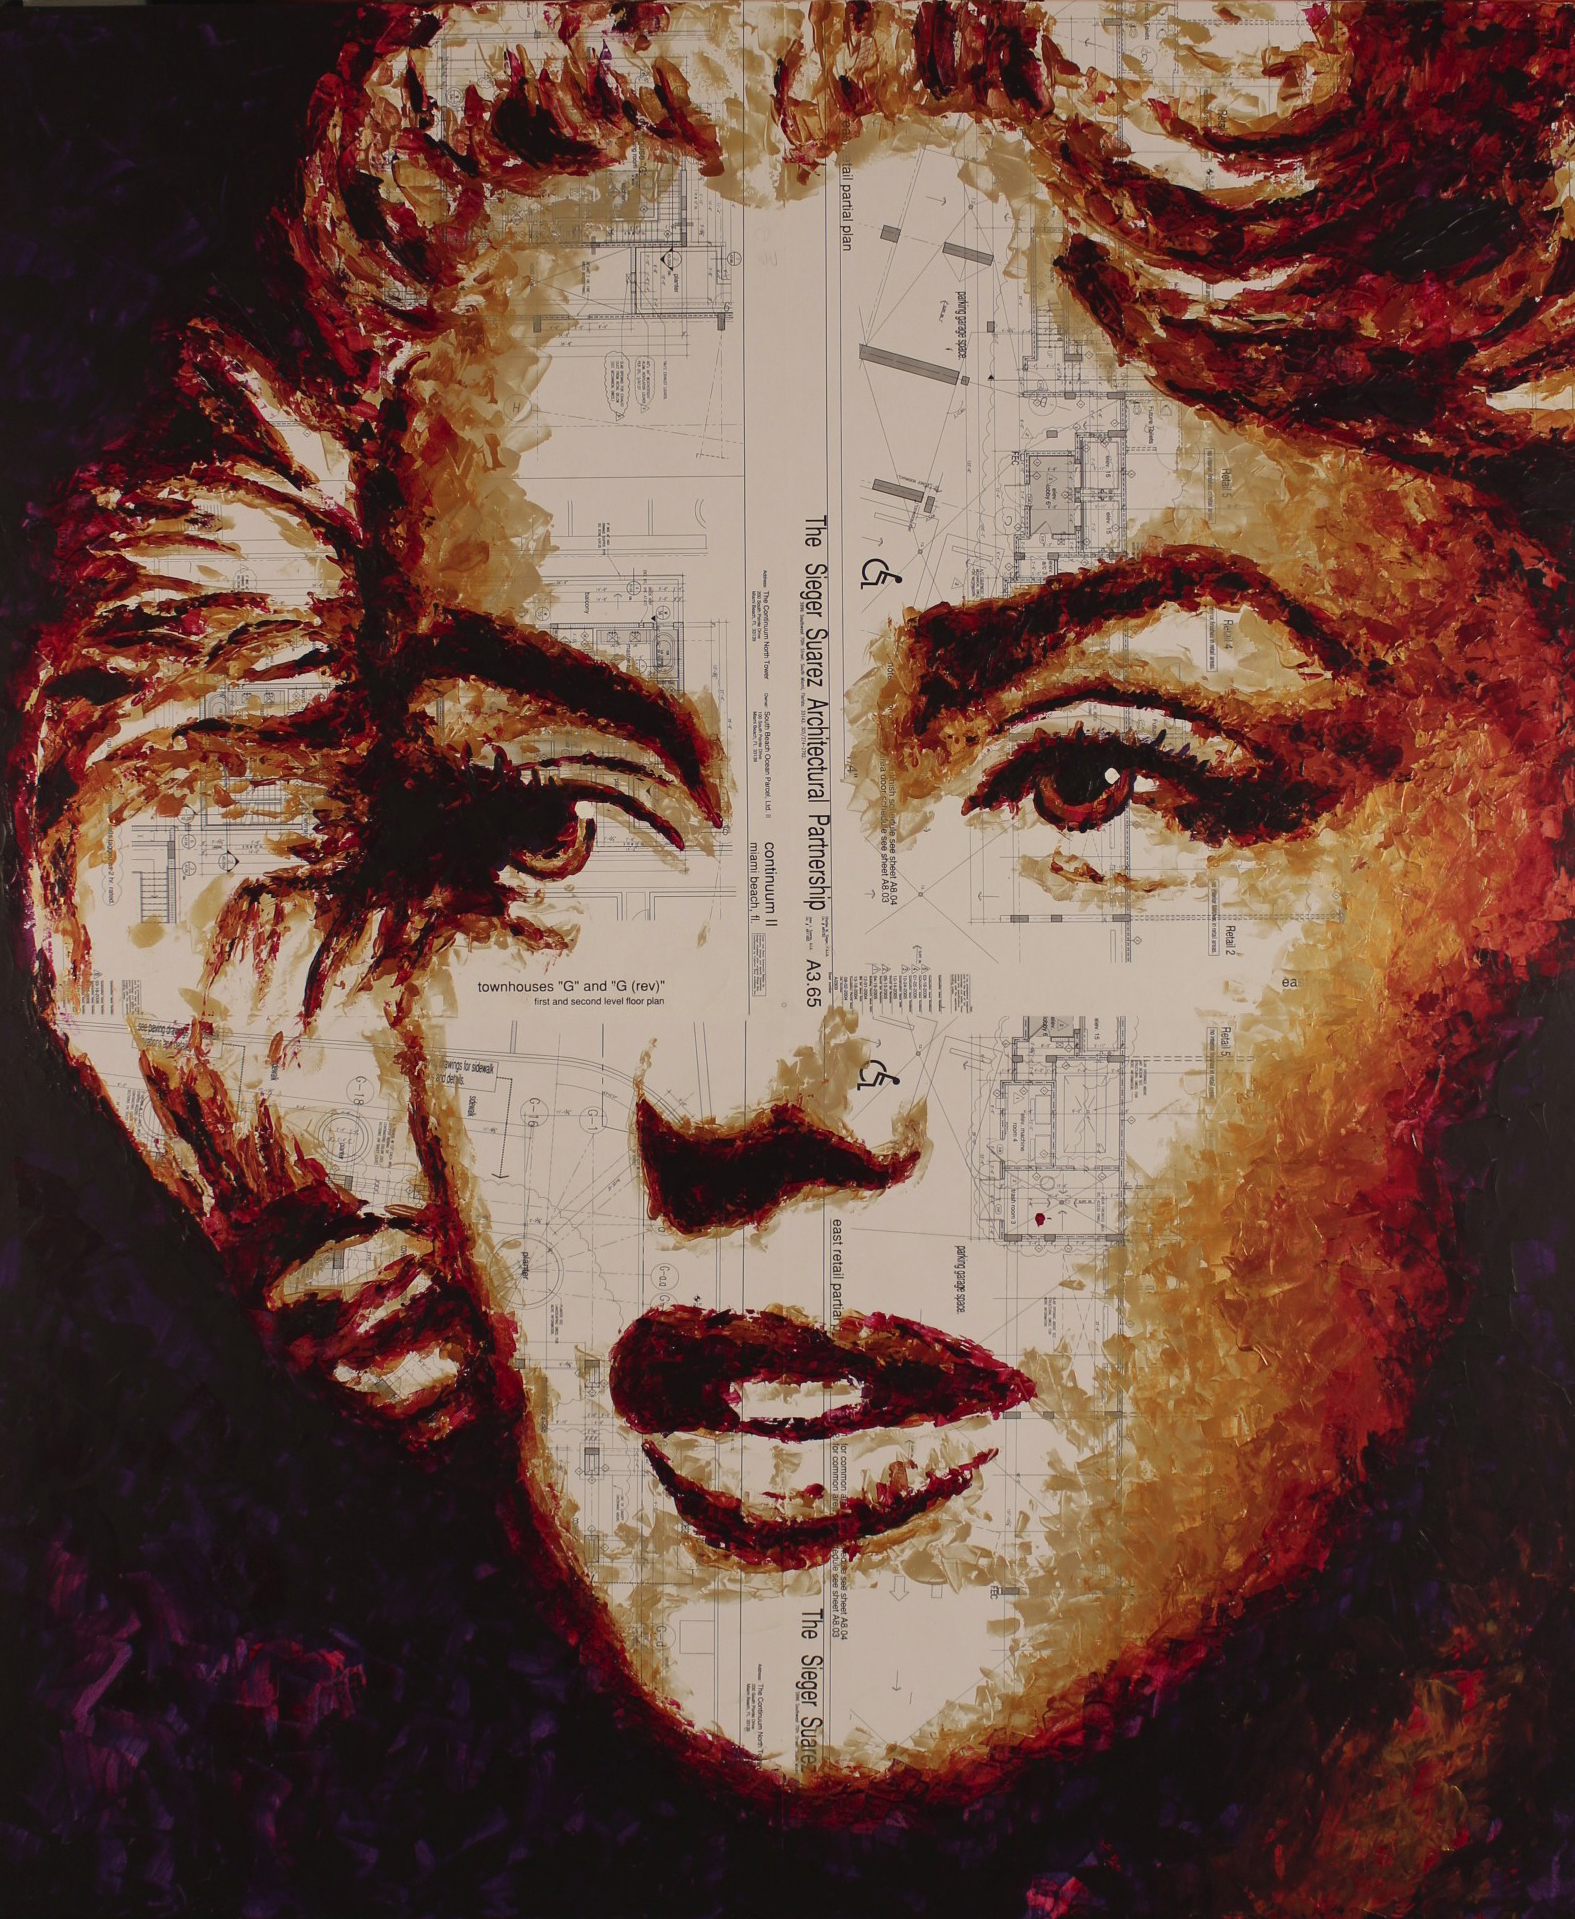 Marilyn at Colette